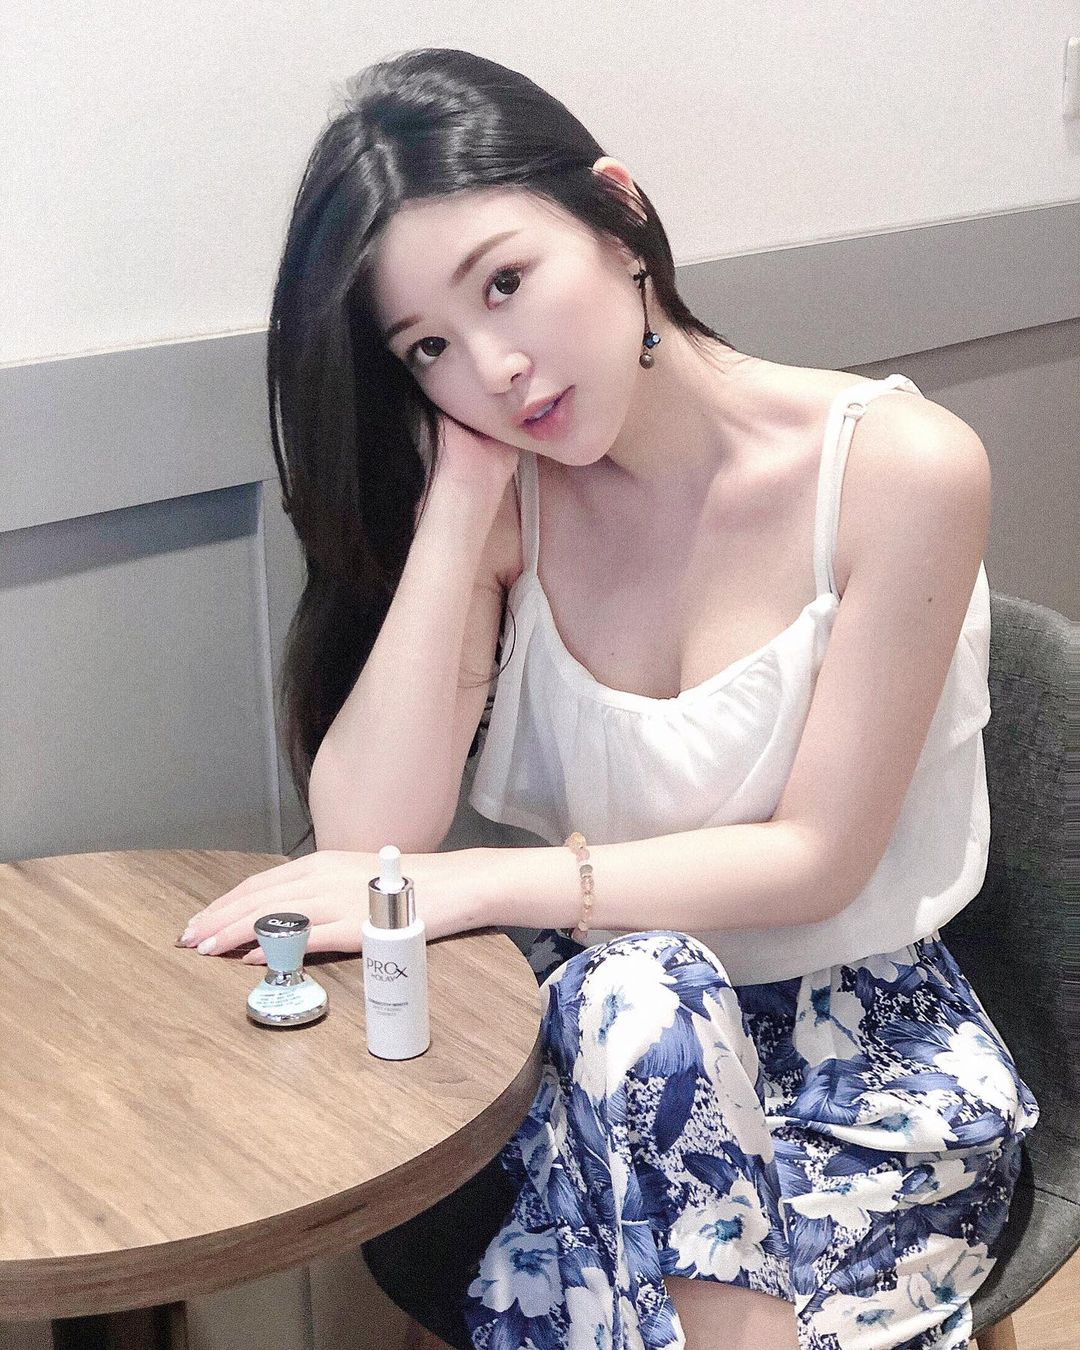 Iris Yen  甜美臉蛋可愛又迷人 …搭配渾圓飽滿身材 - 美女圖 -